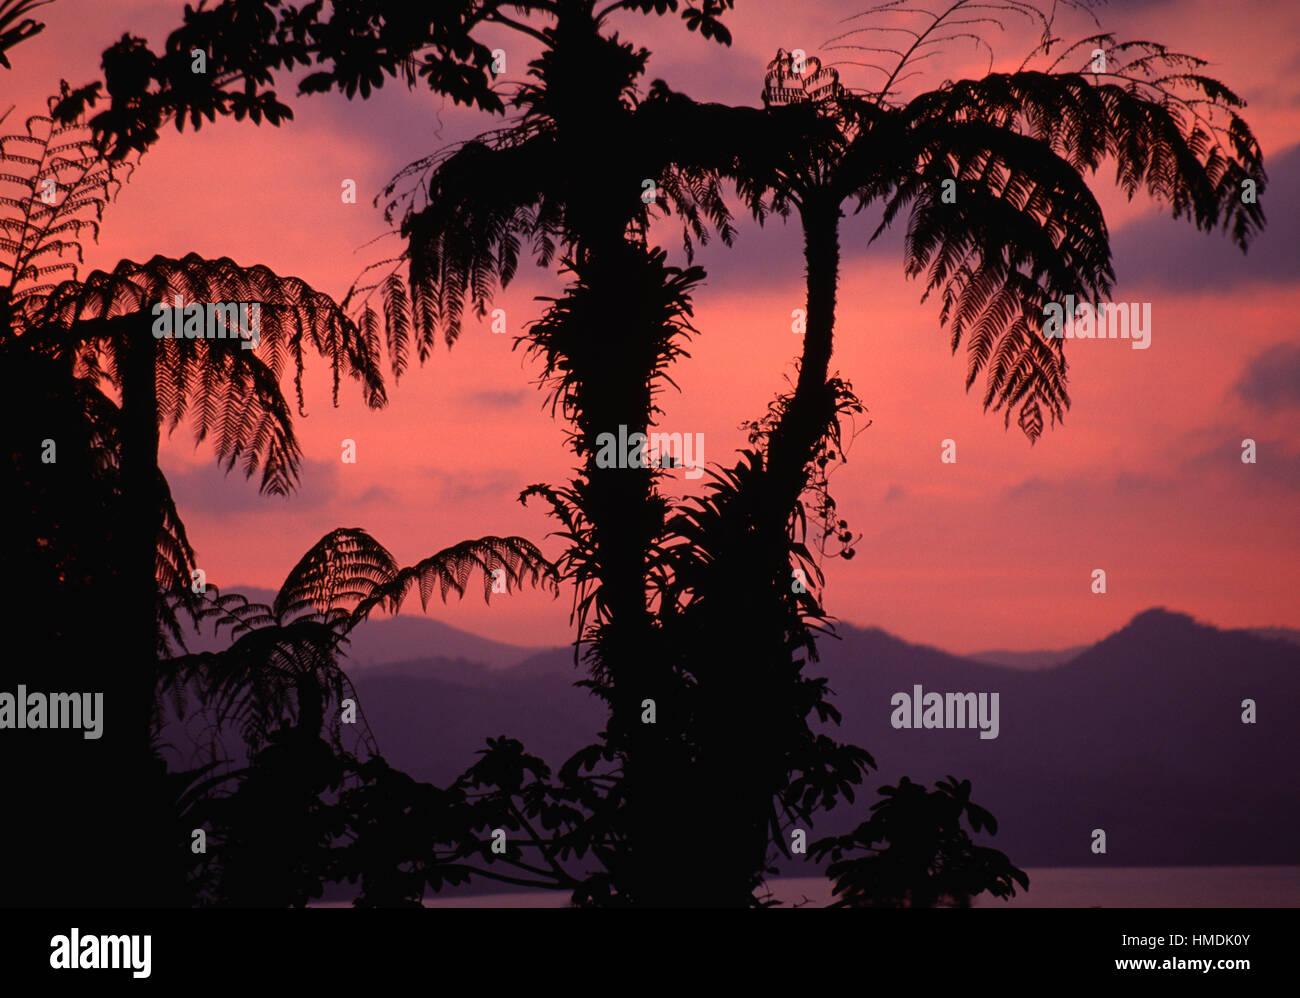 Lake Arenal at sunset. Arenal National Park, Costa Rica - Stock Image